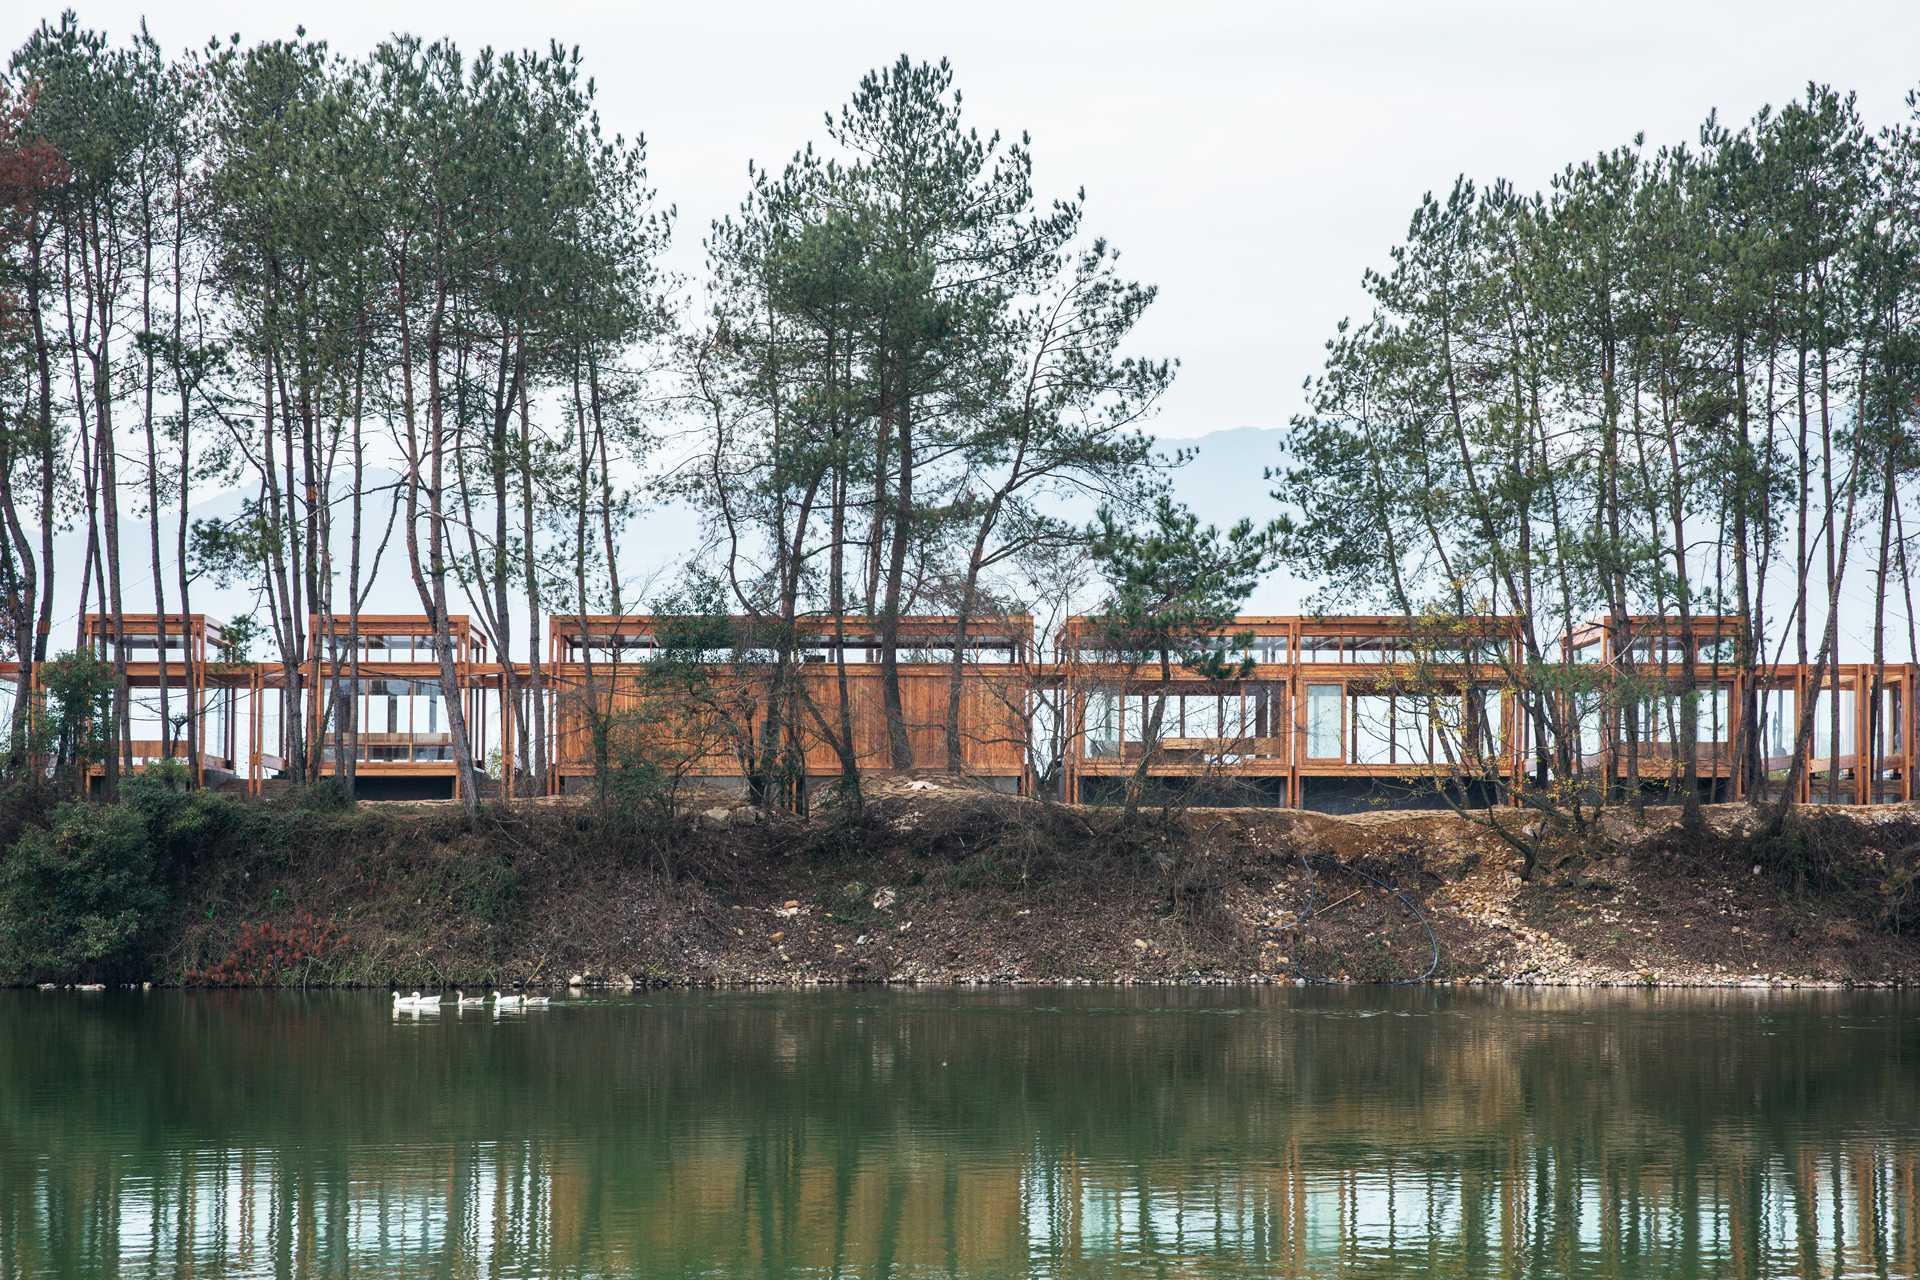 Pine Pavilion  - 19 02 33